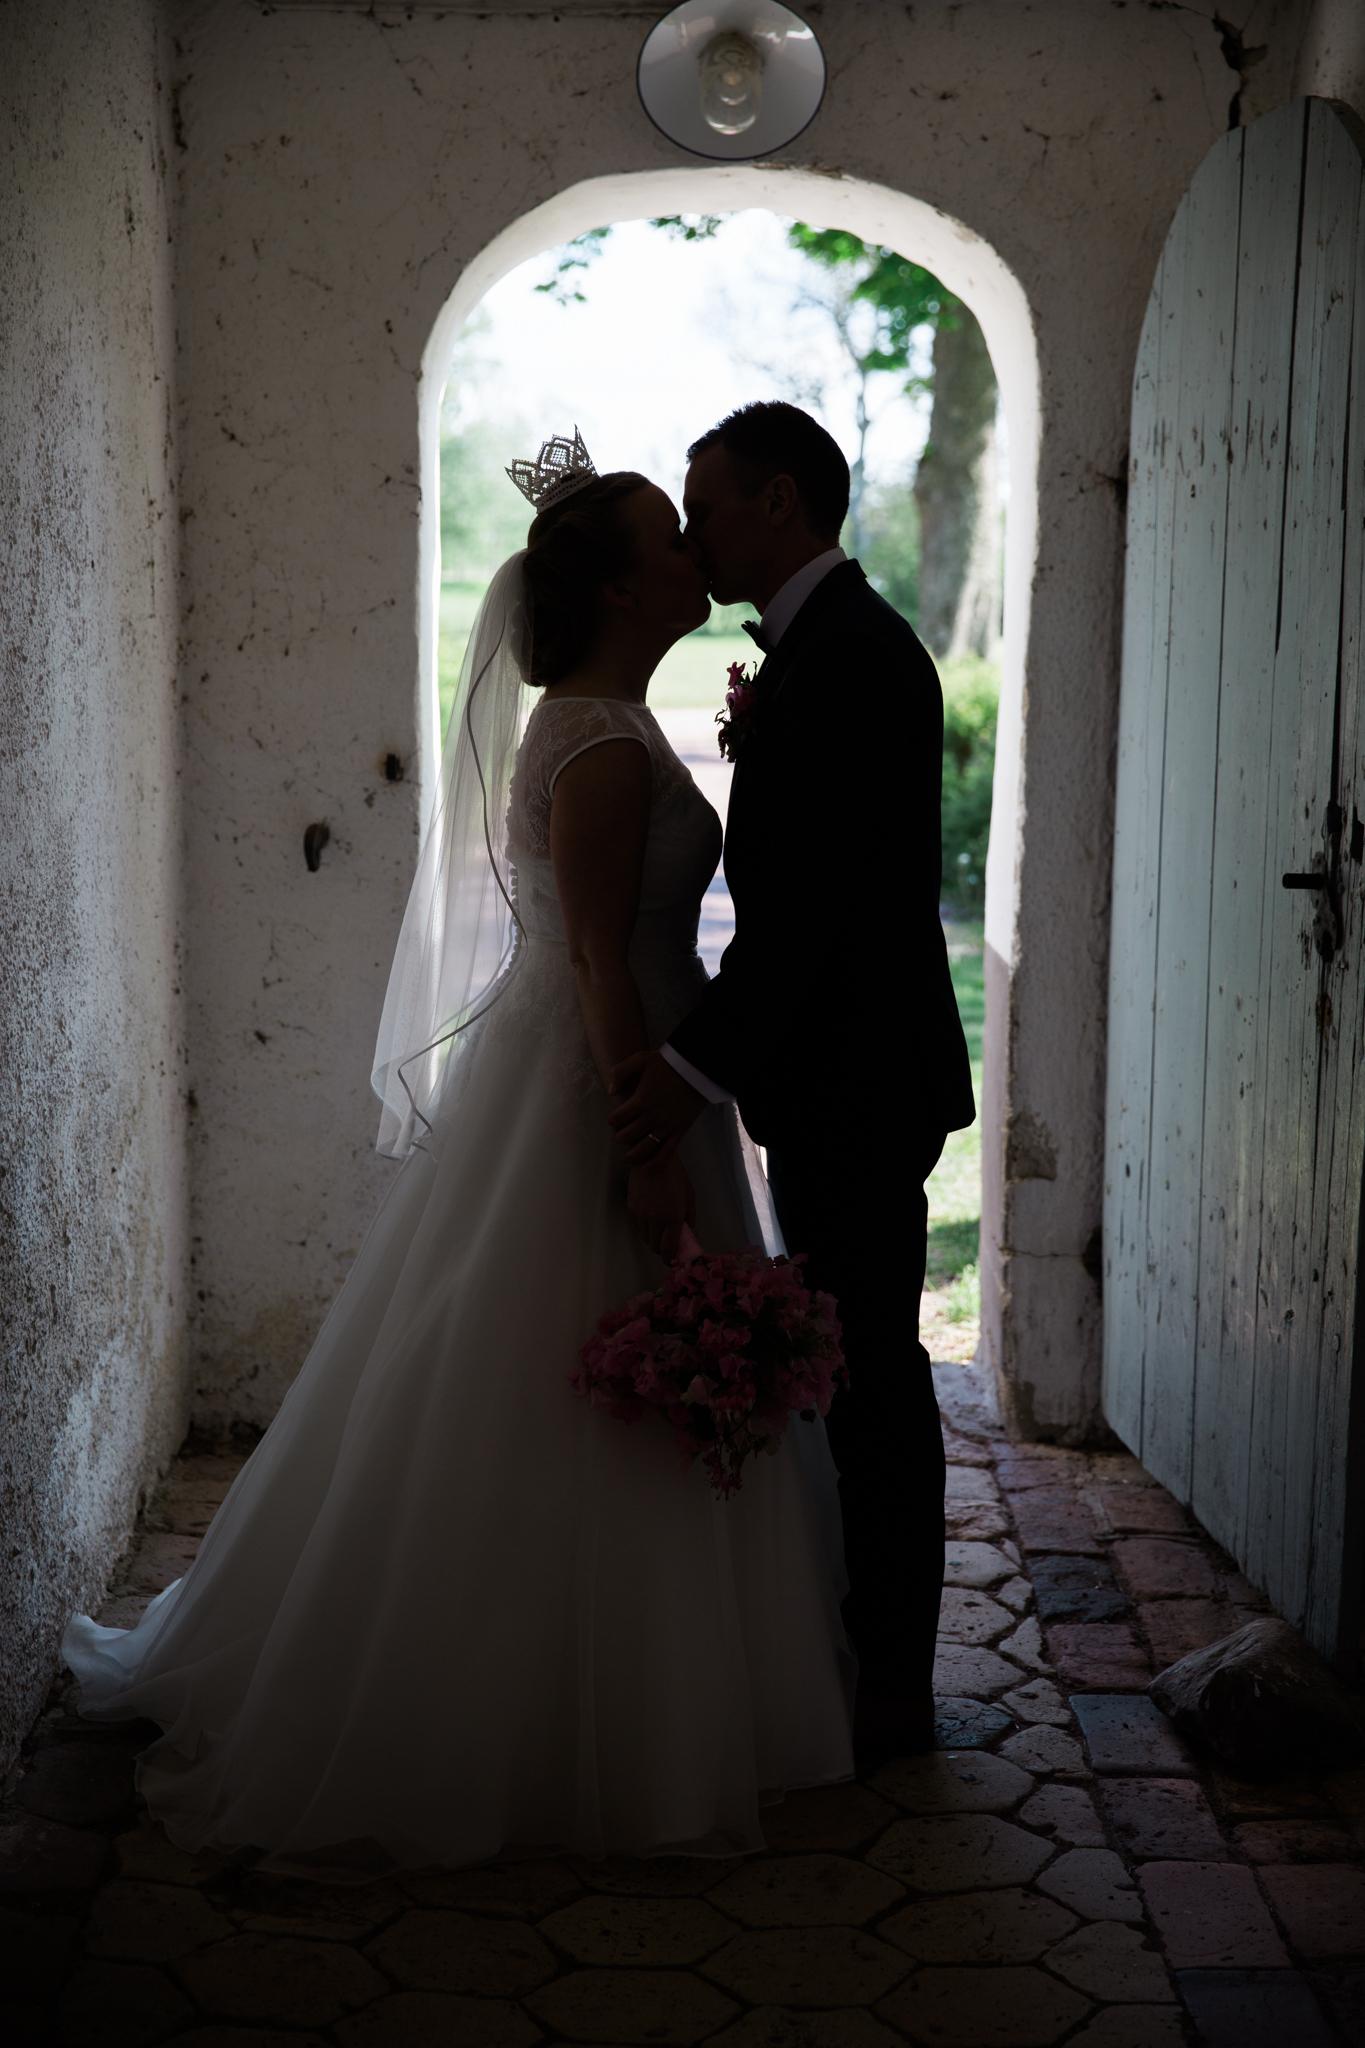 ViOli Photography bröllopsfotograf-Karlshamn-Blekinge-Ronneby-Karlskrona-Sölvesborg-Bromölla-Kristianstad (29 av 35)